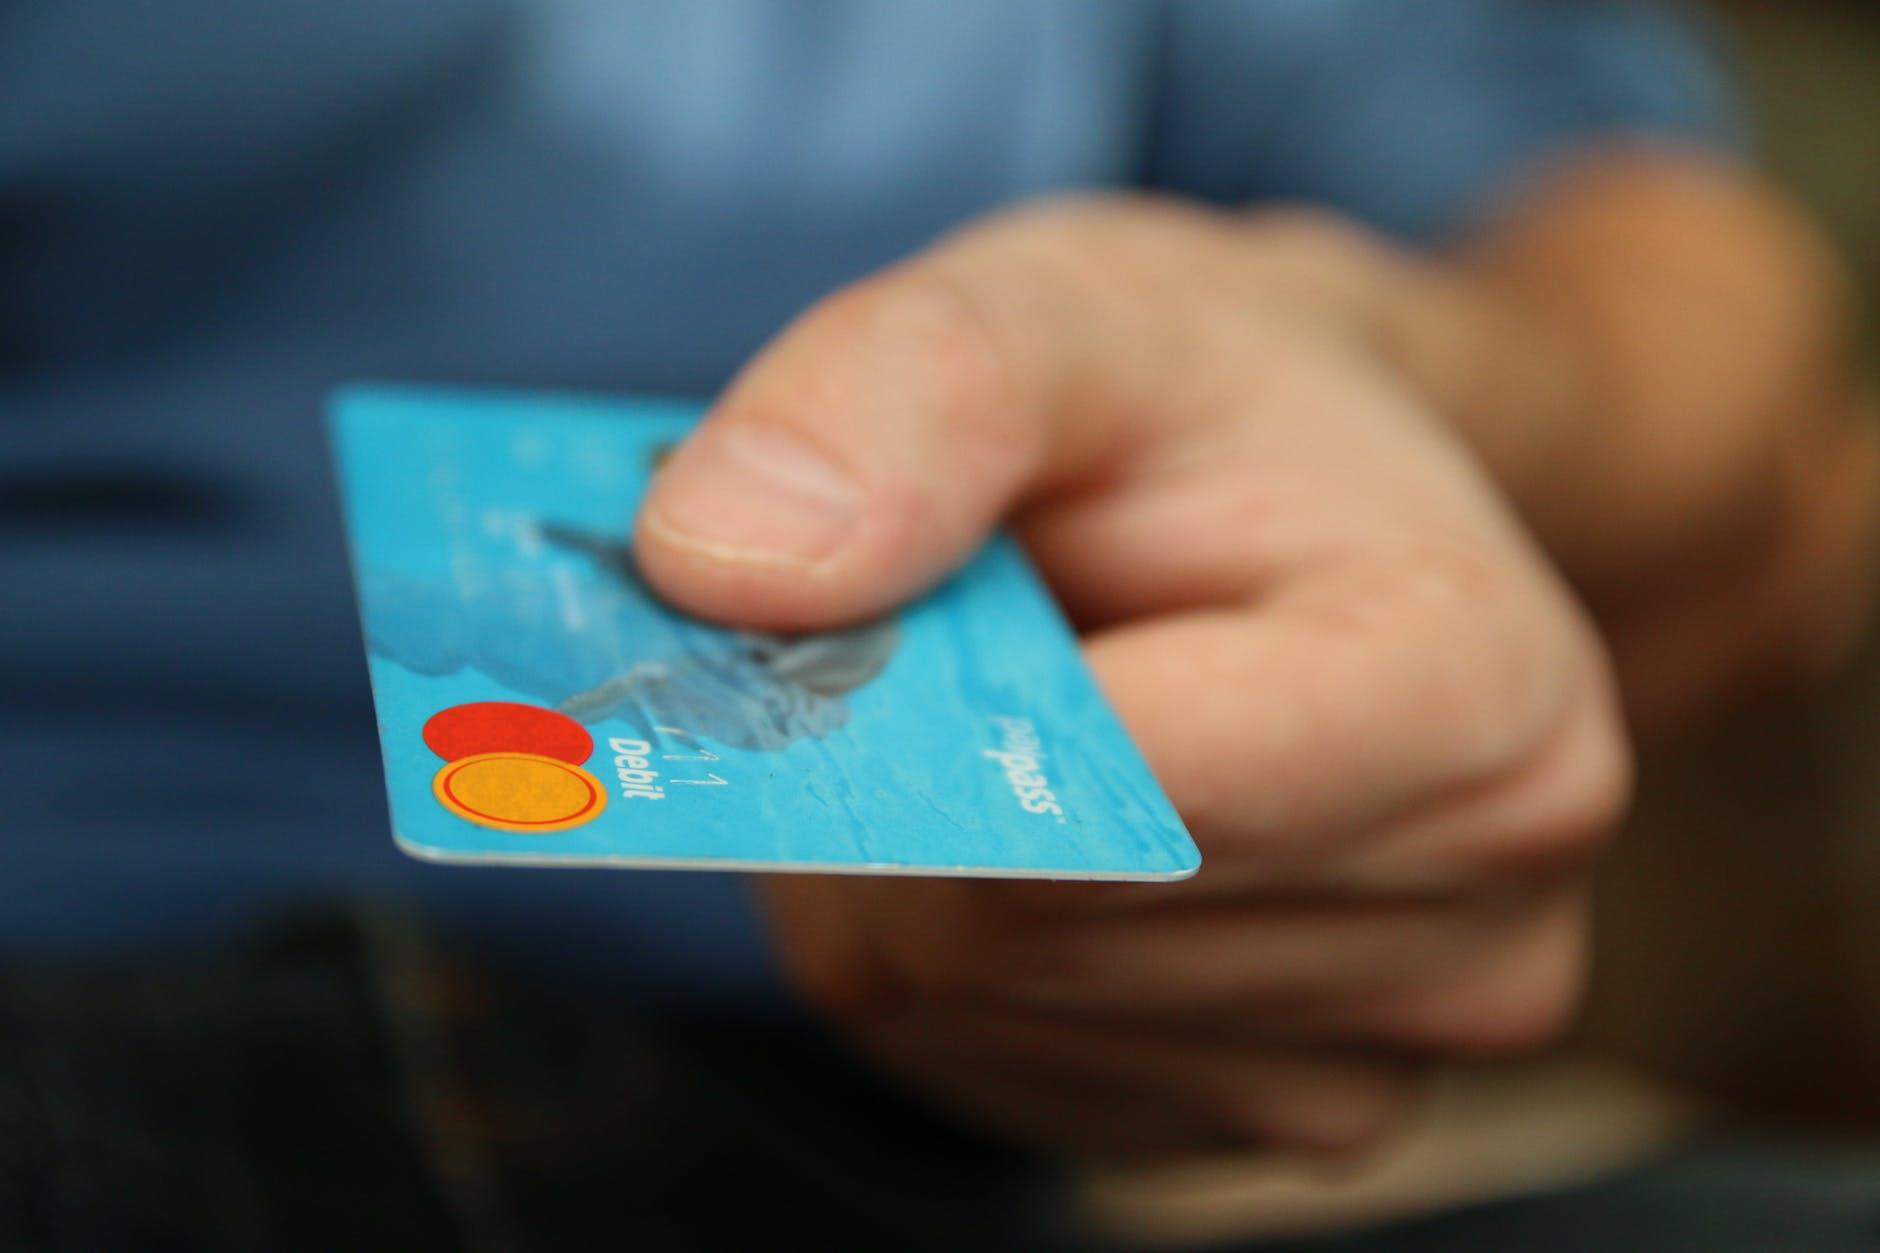 Holding debit card